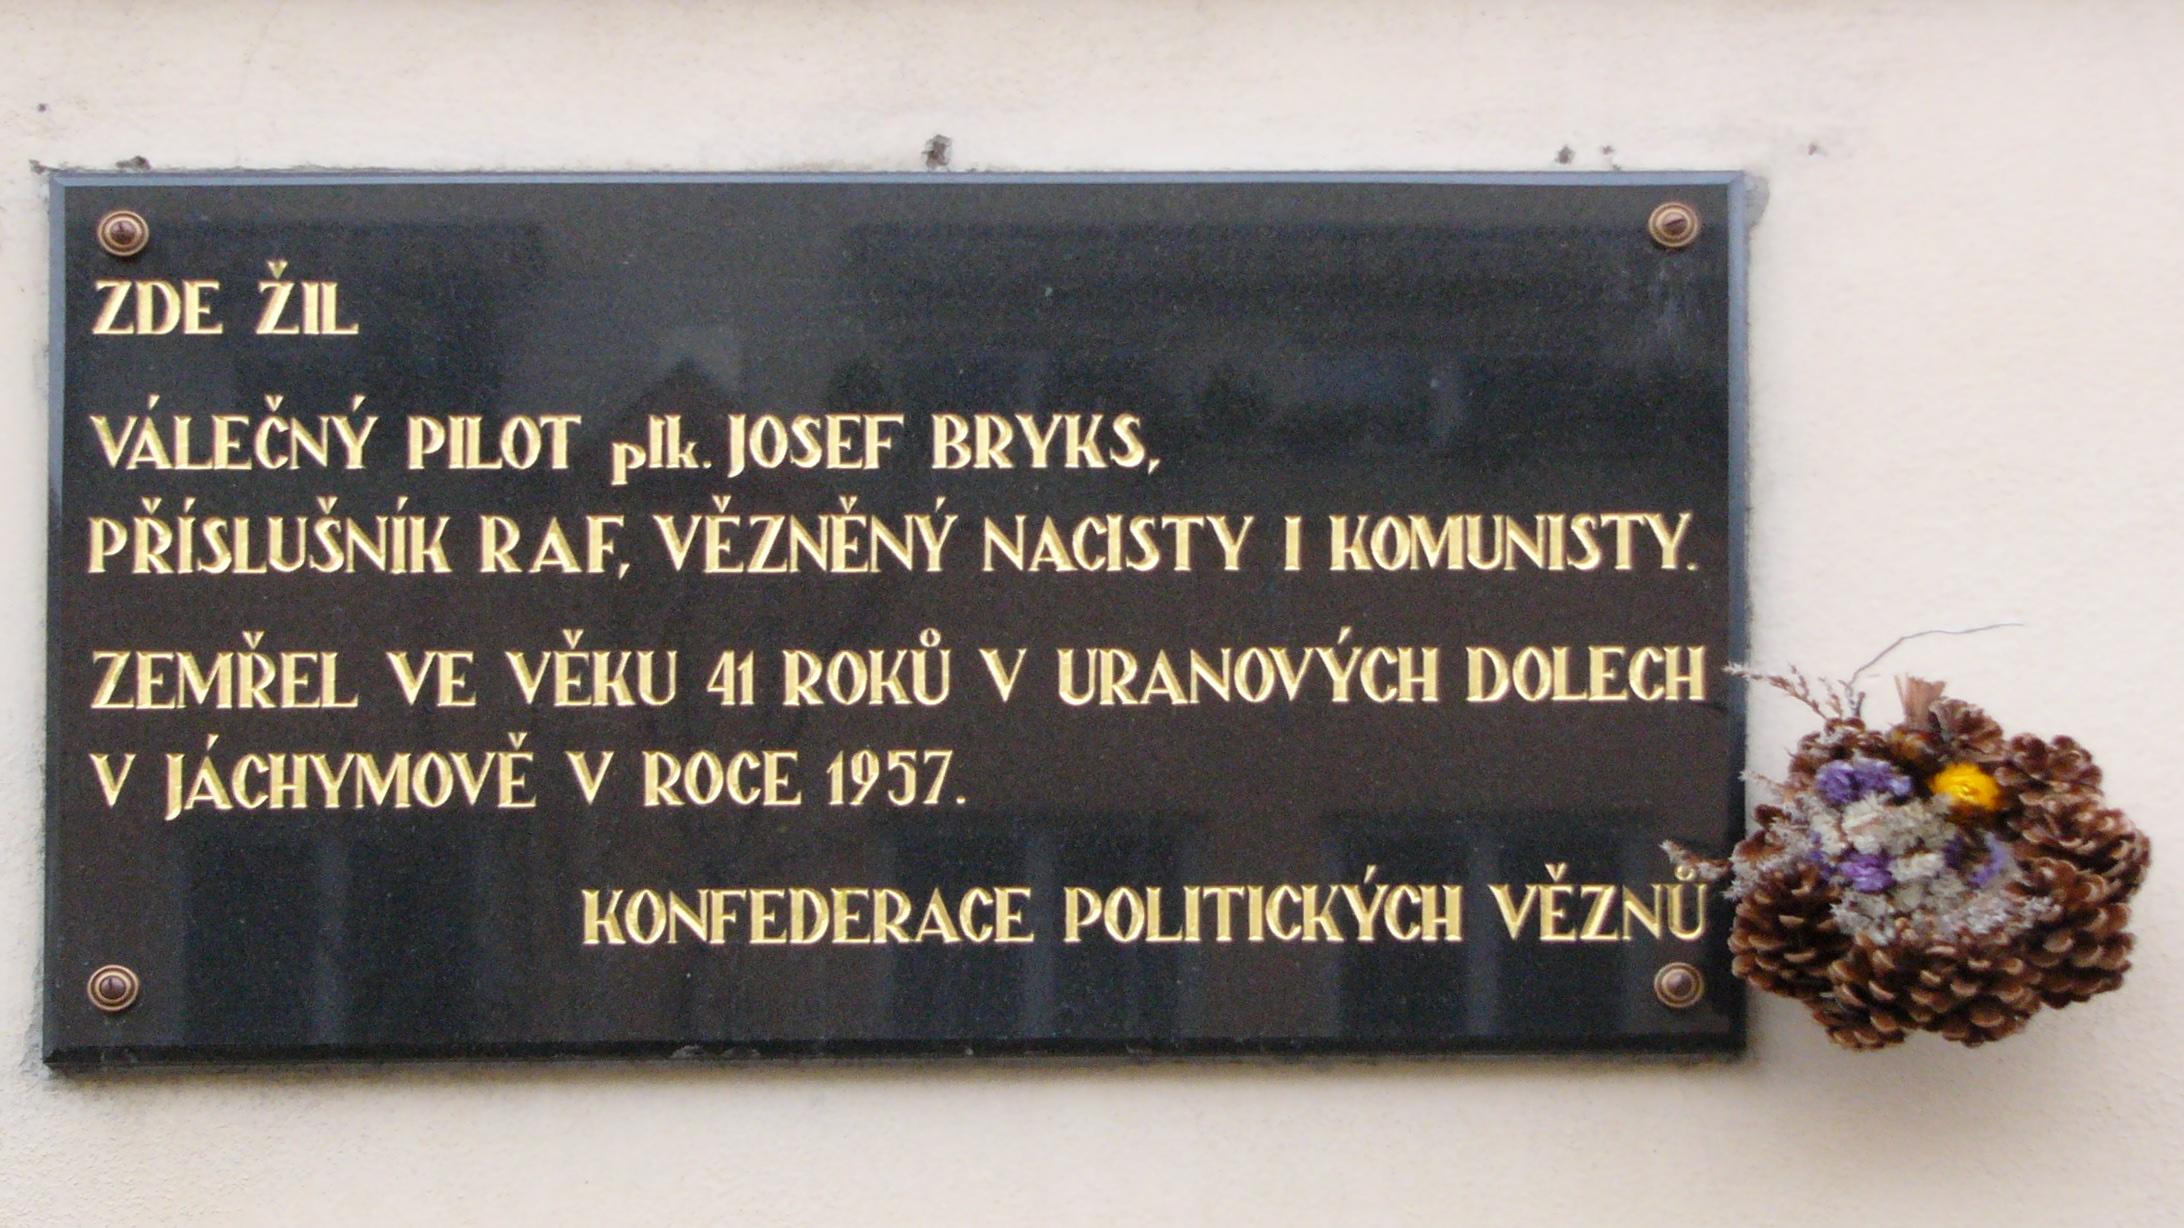 Vojenský pilot Josef Bryks